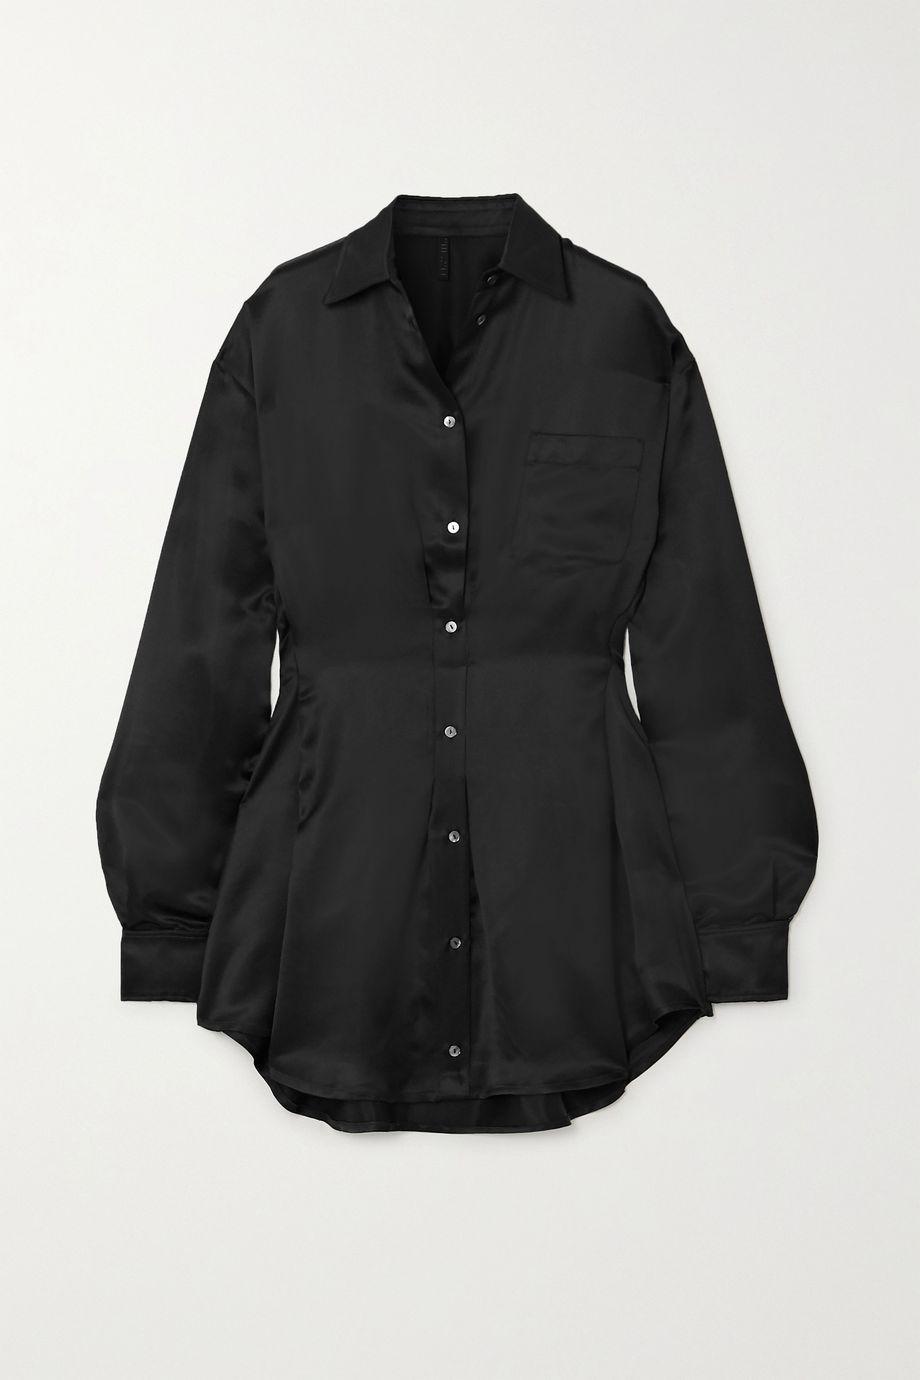 Unravel Project Satin mini shirt dress